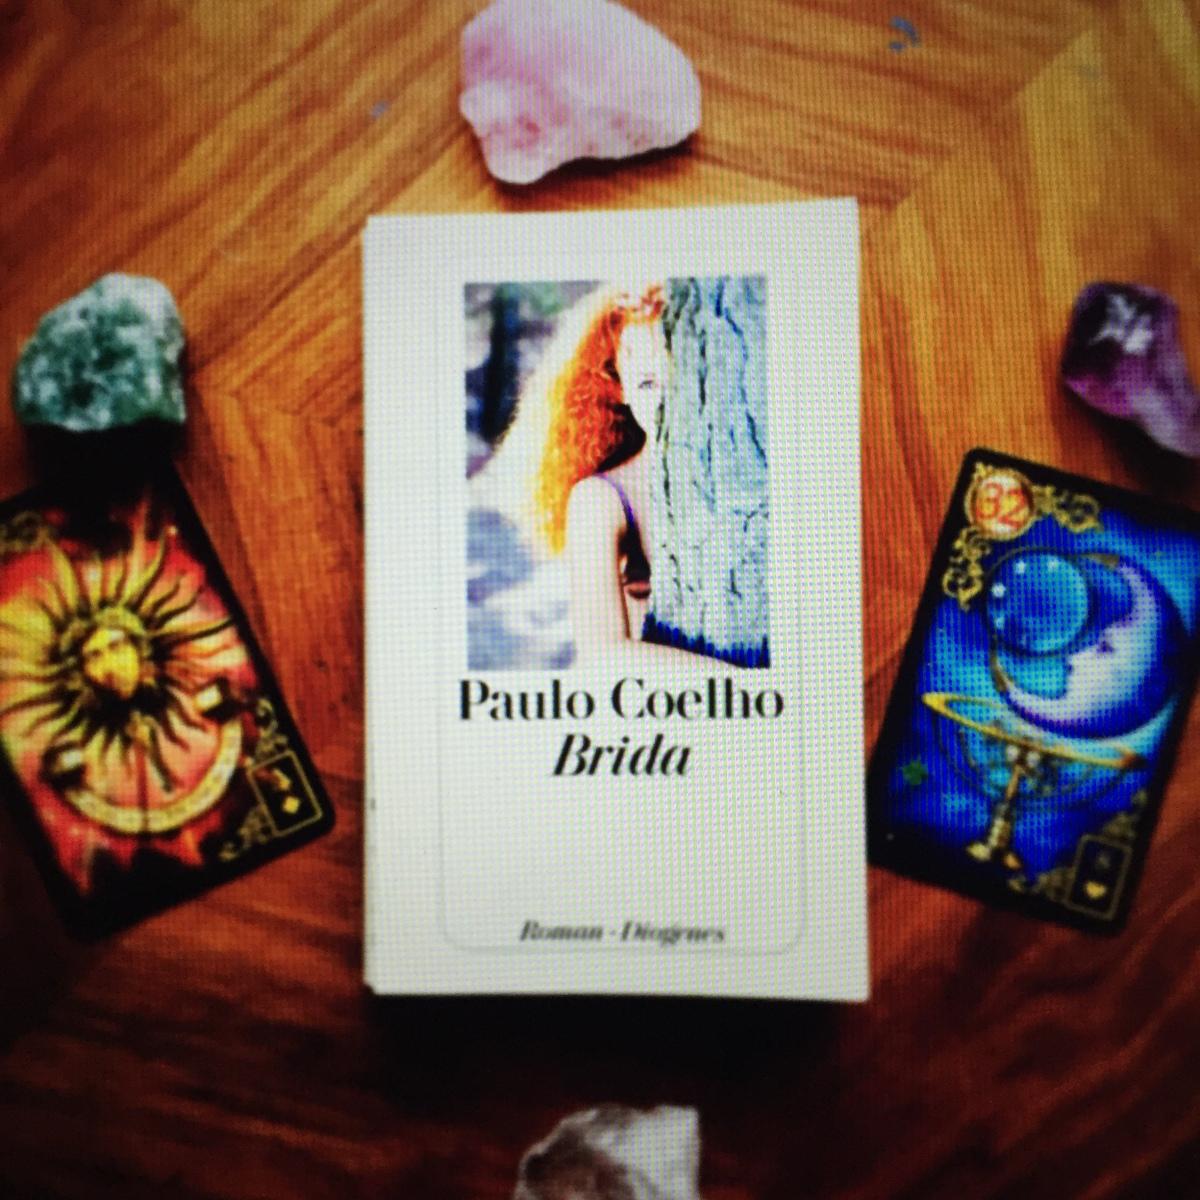 Brida * Paulo Coelho